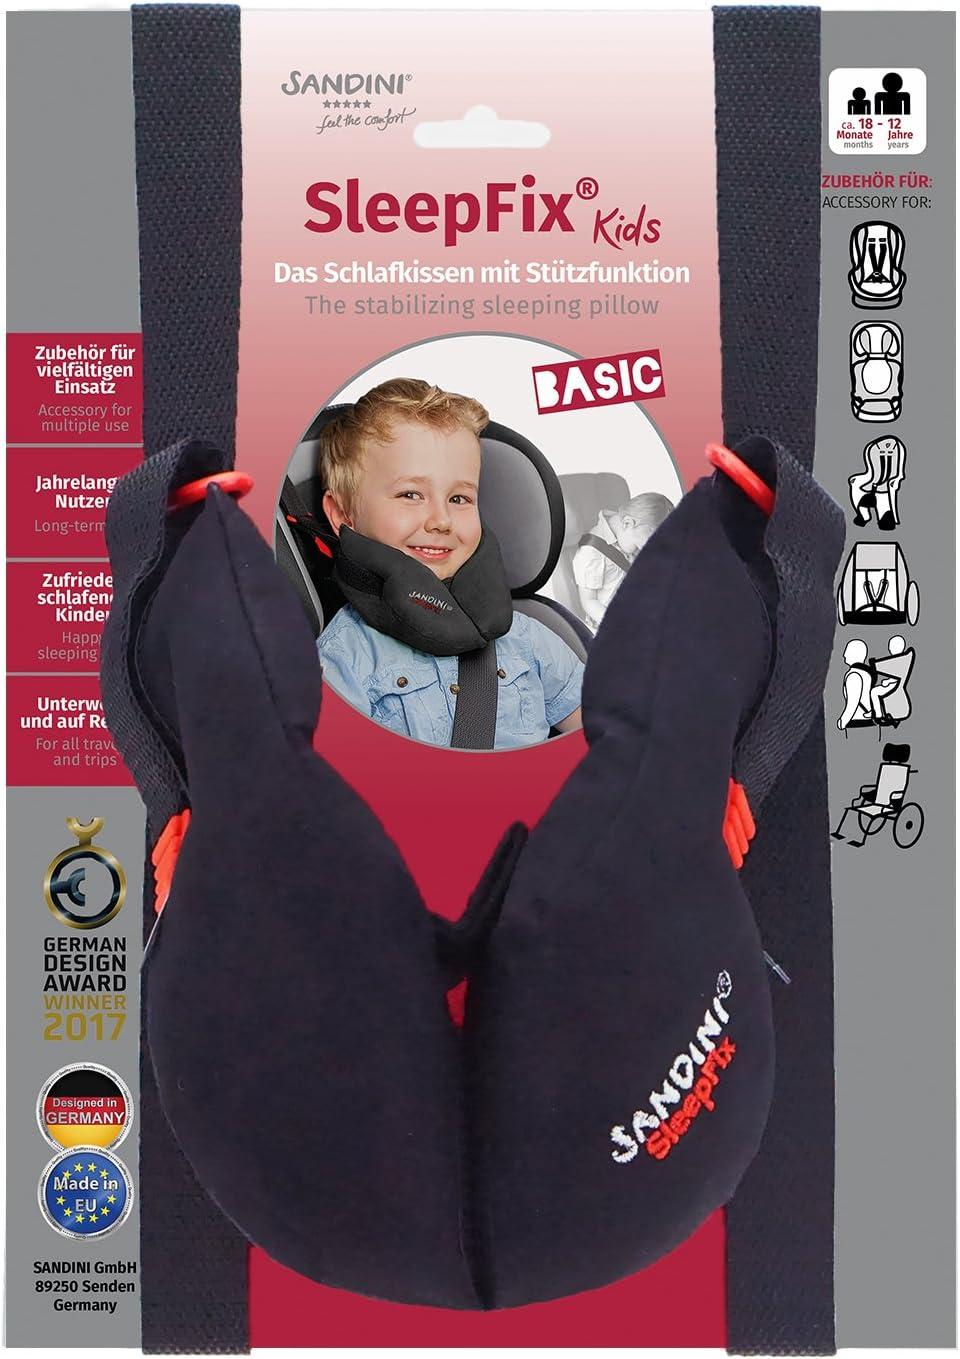 SANDINI SleepFix® Kids BASIC – Cojín infantil con función - Accesorios de asiento infantil para coche/bicicleta/viaje - Evita que la cabeza de su hijo caiga mientras duerme